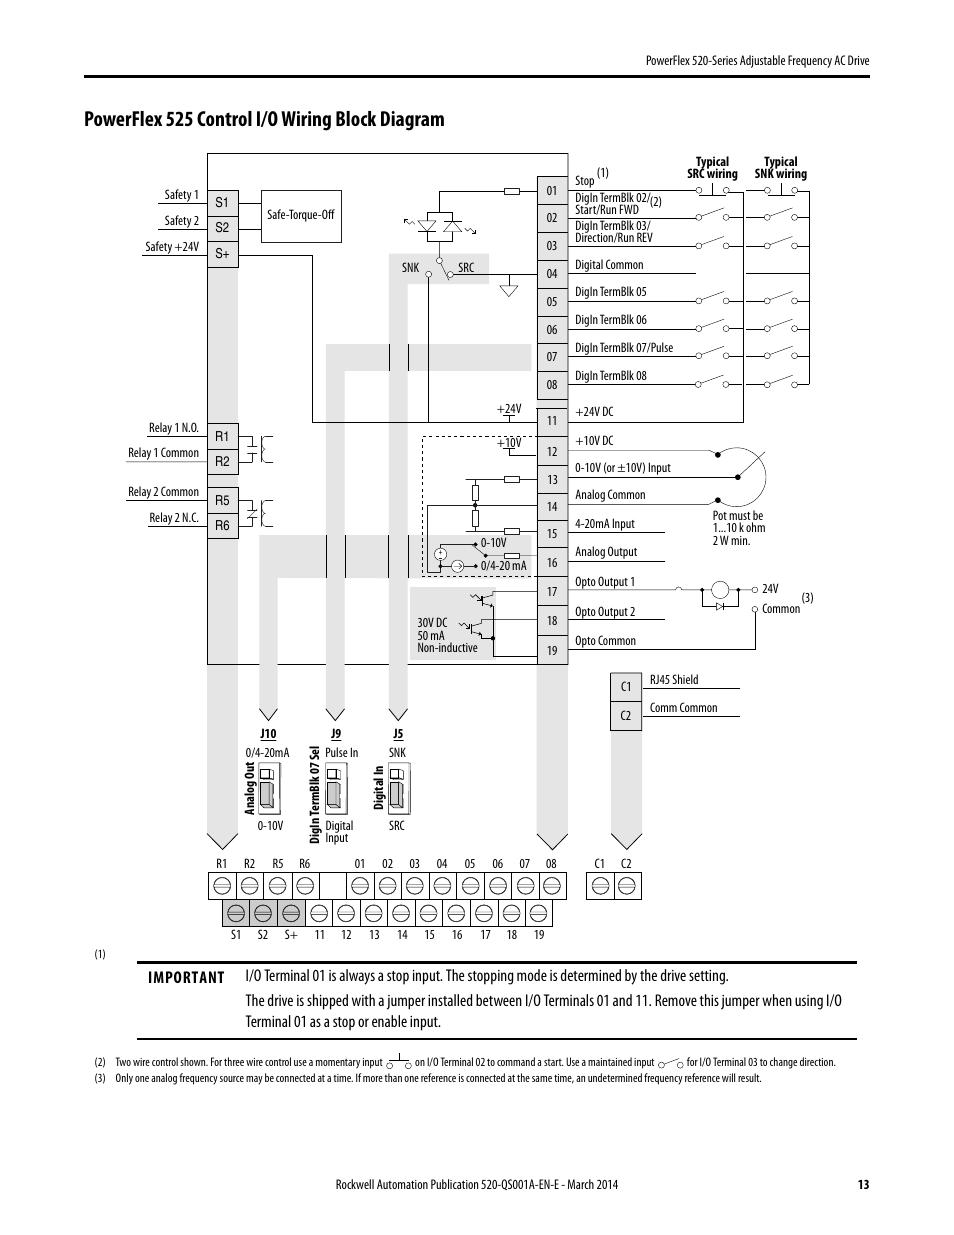 Enable Wiring Diagram Powerflex 753 Control